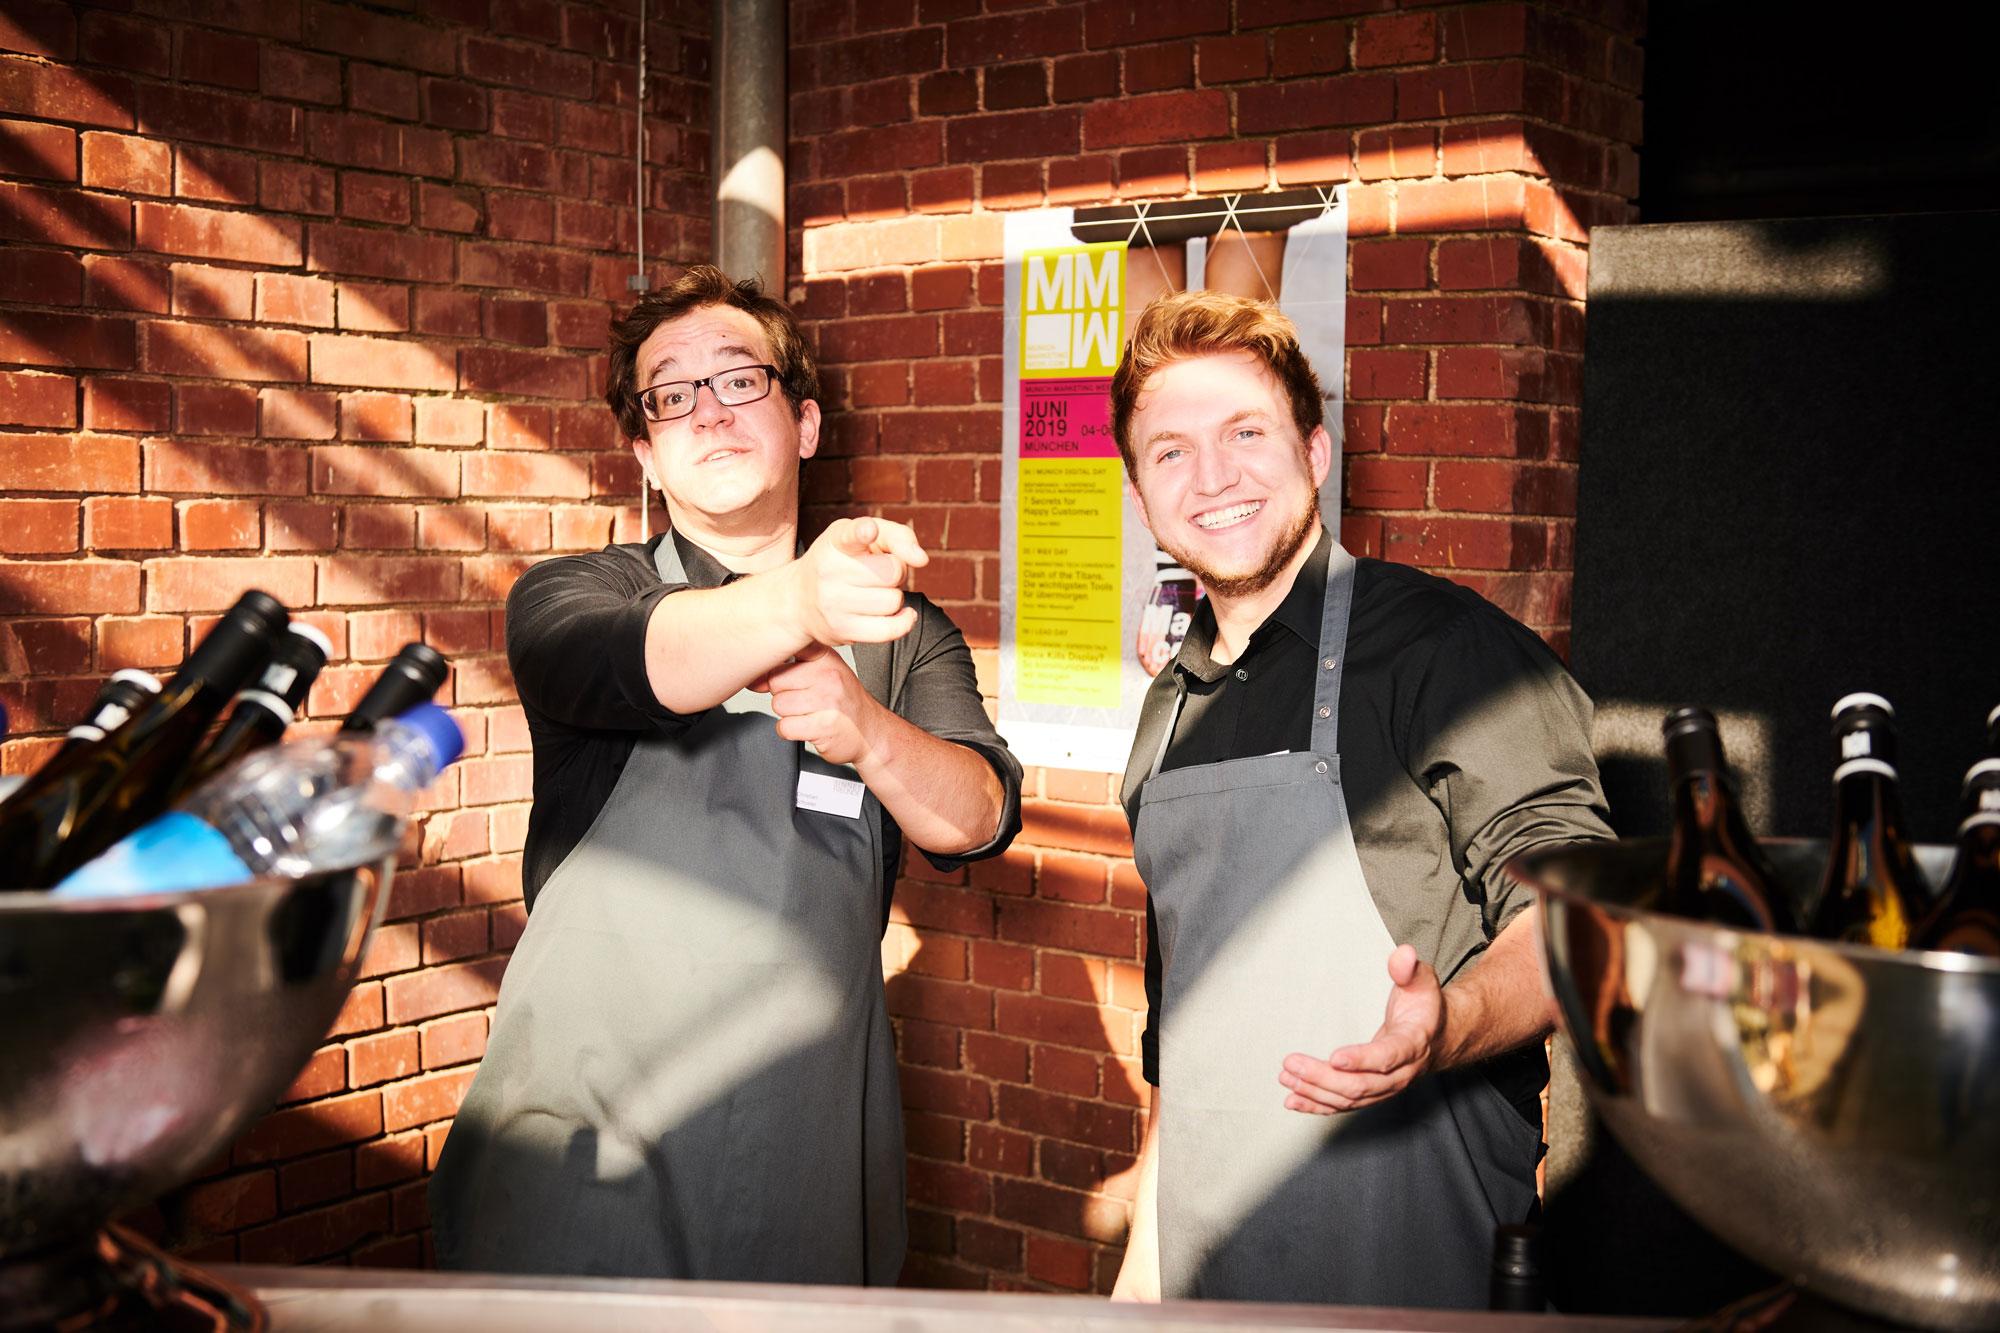 ziegelei101 Innenhof impression catering event bar